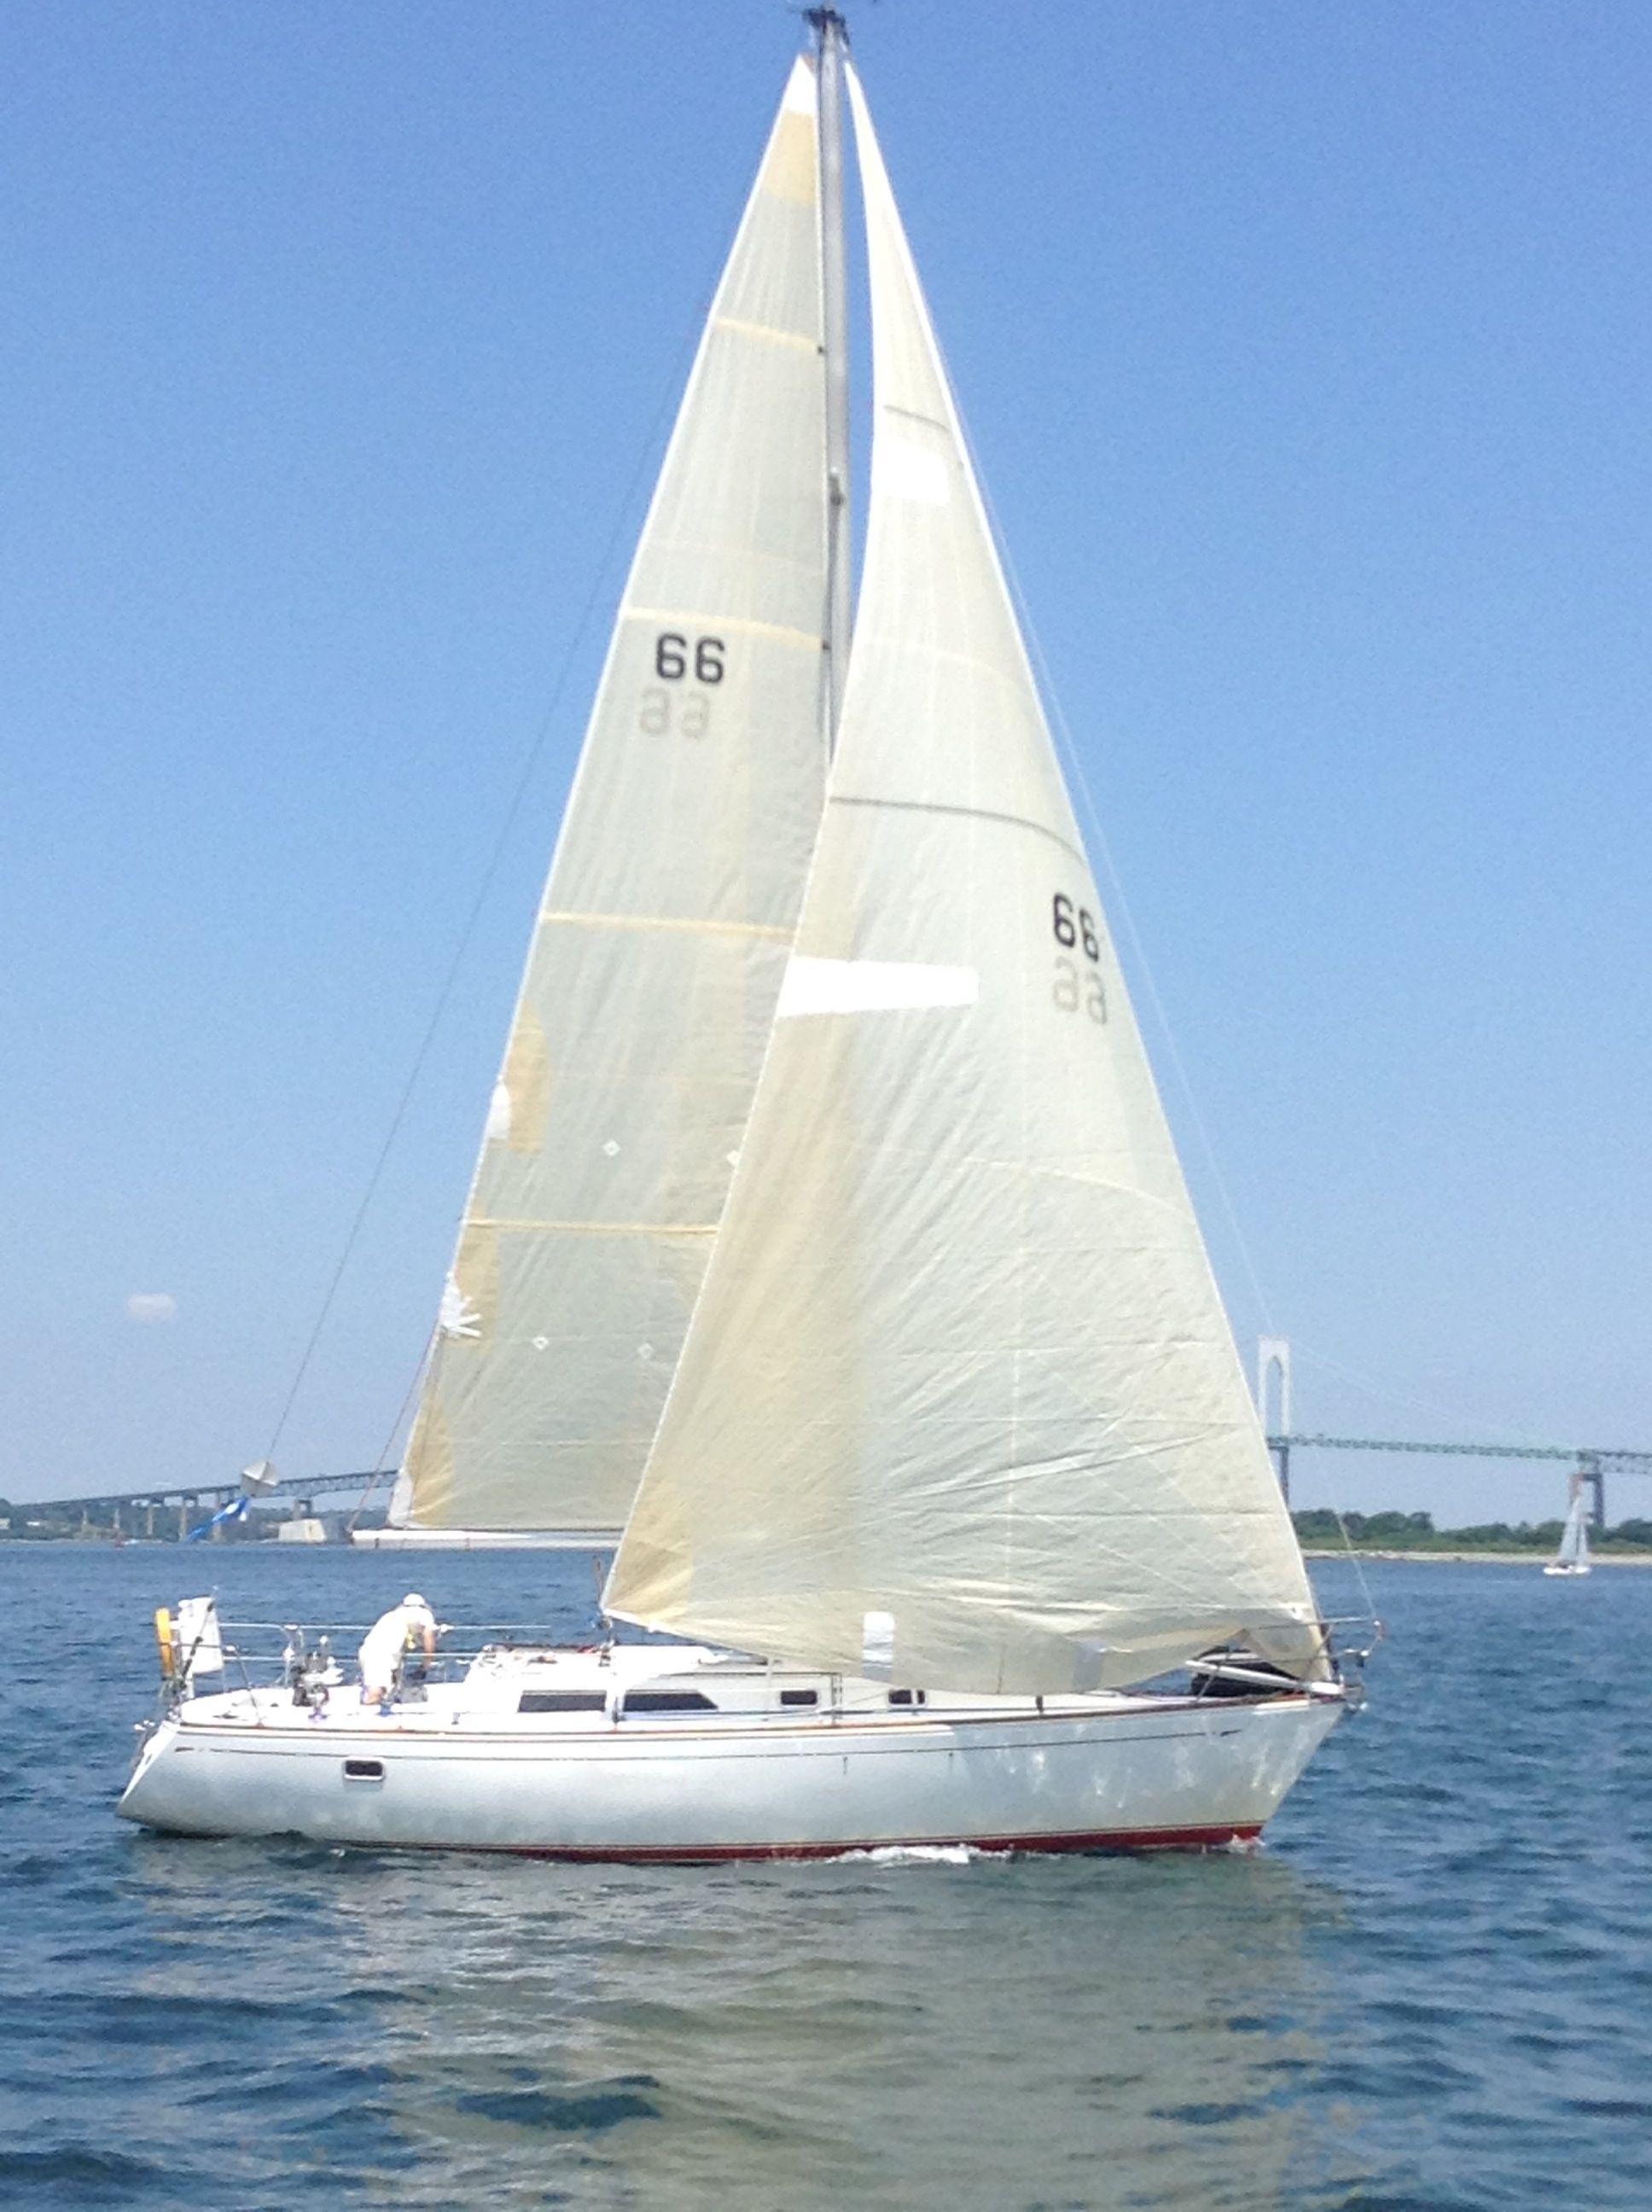 Jack C  won the Offshore 160 race using his Sailrite main